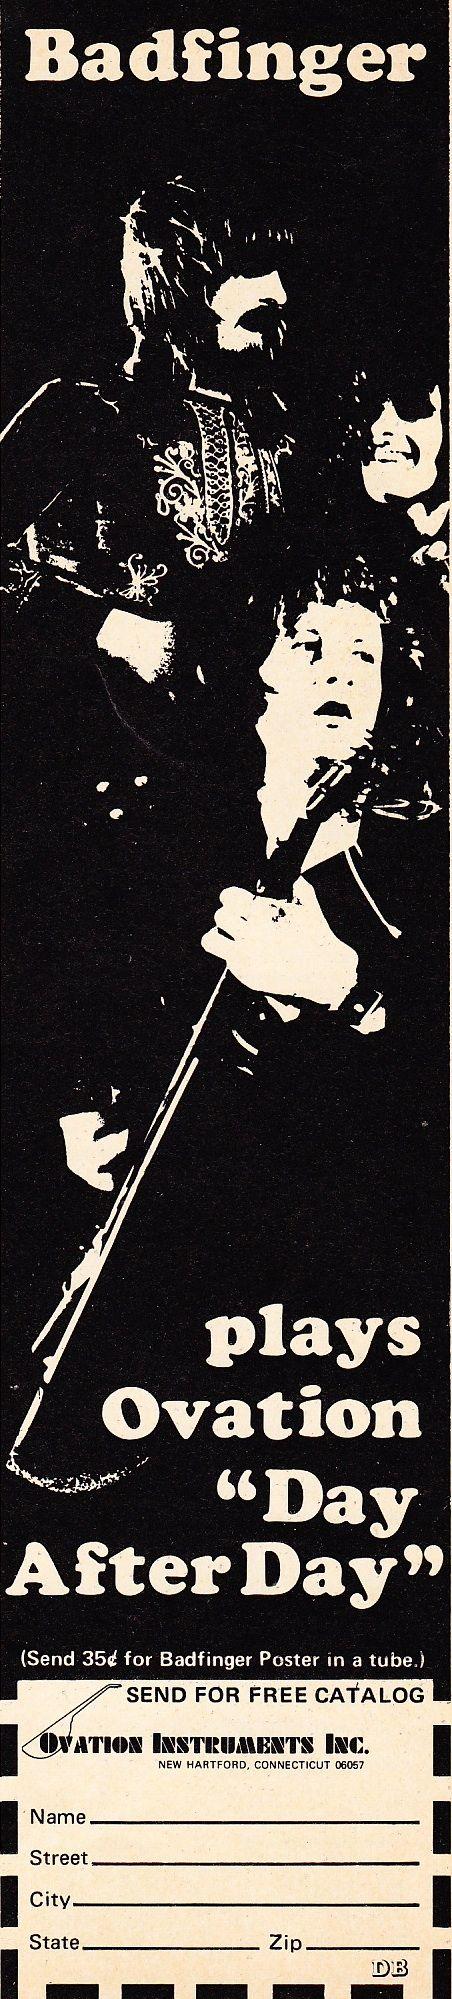 Badfinger Ovation ad 1973